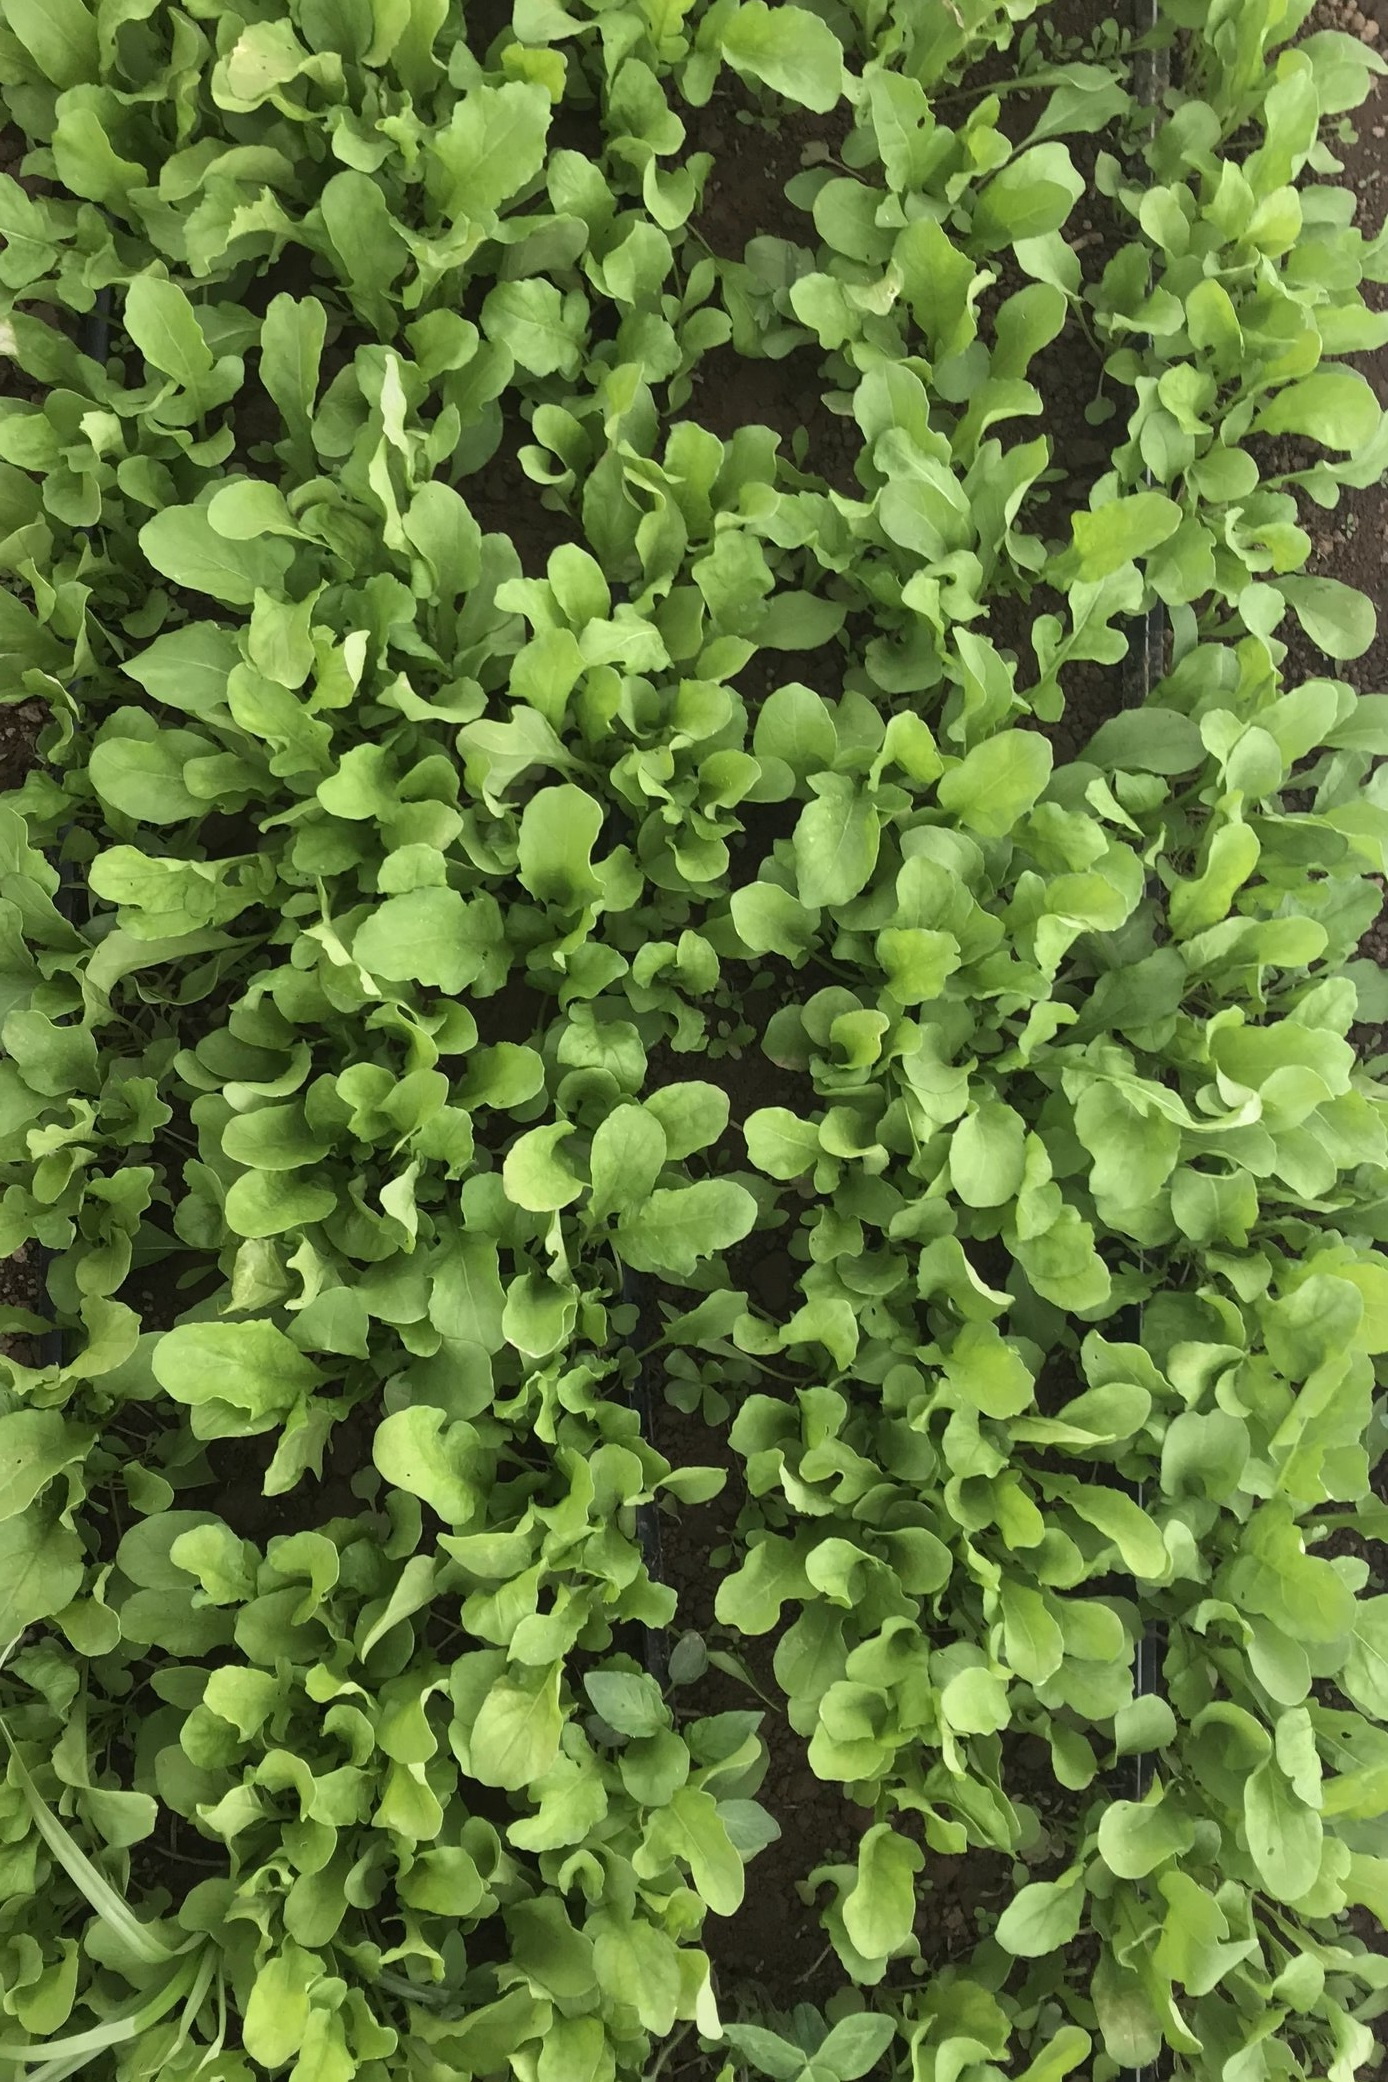 pdx+organic+salad+greens+2.jpg